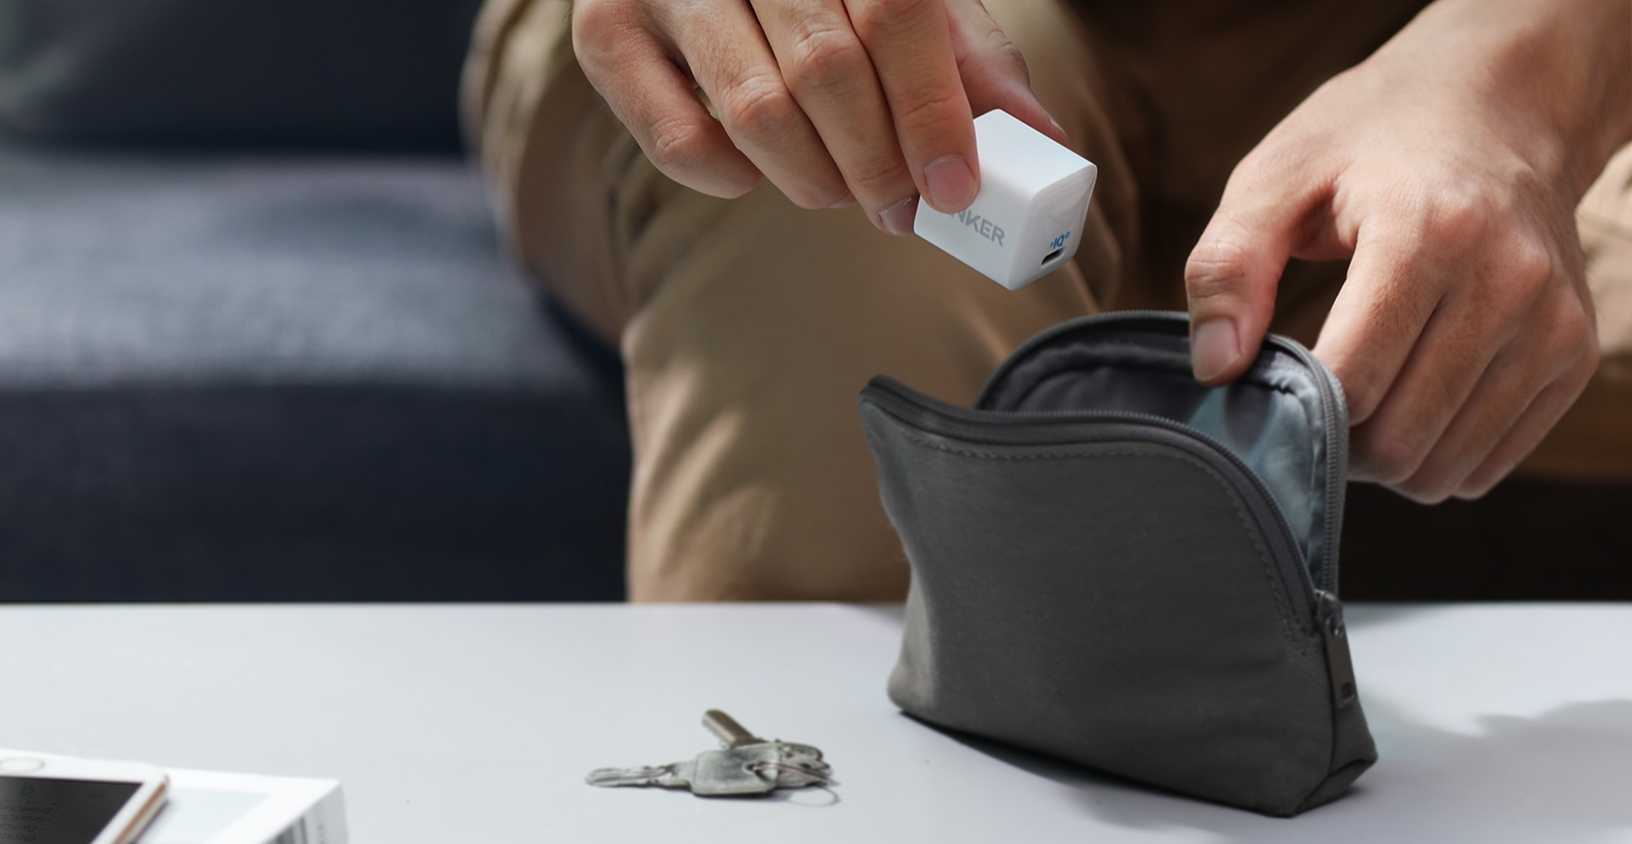 ANKER 超迷你充電器 PowerPort III Nano 新發表,兼容 iPhone 12 快充協議、30 分鐘充電 50%